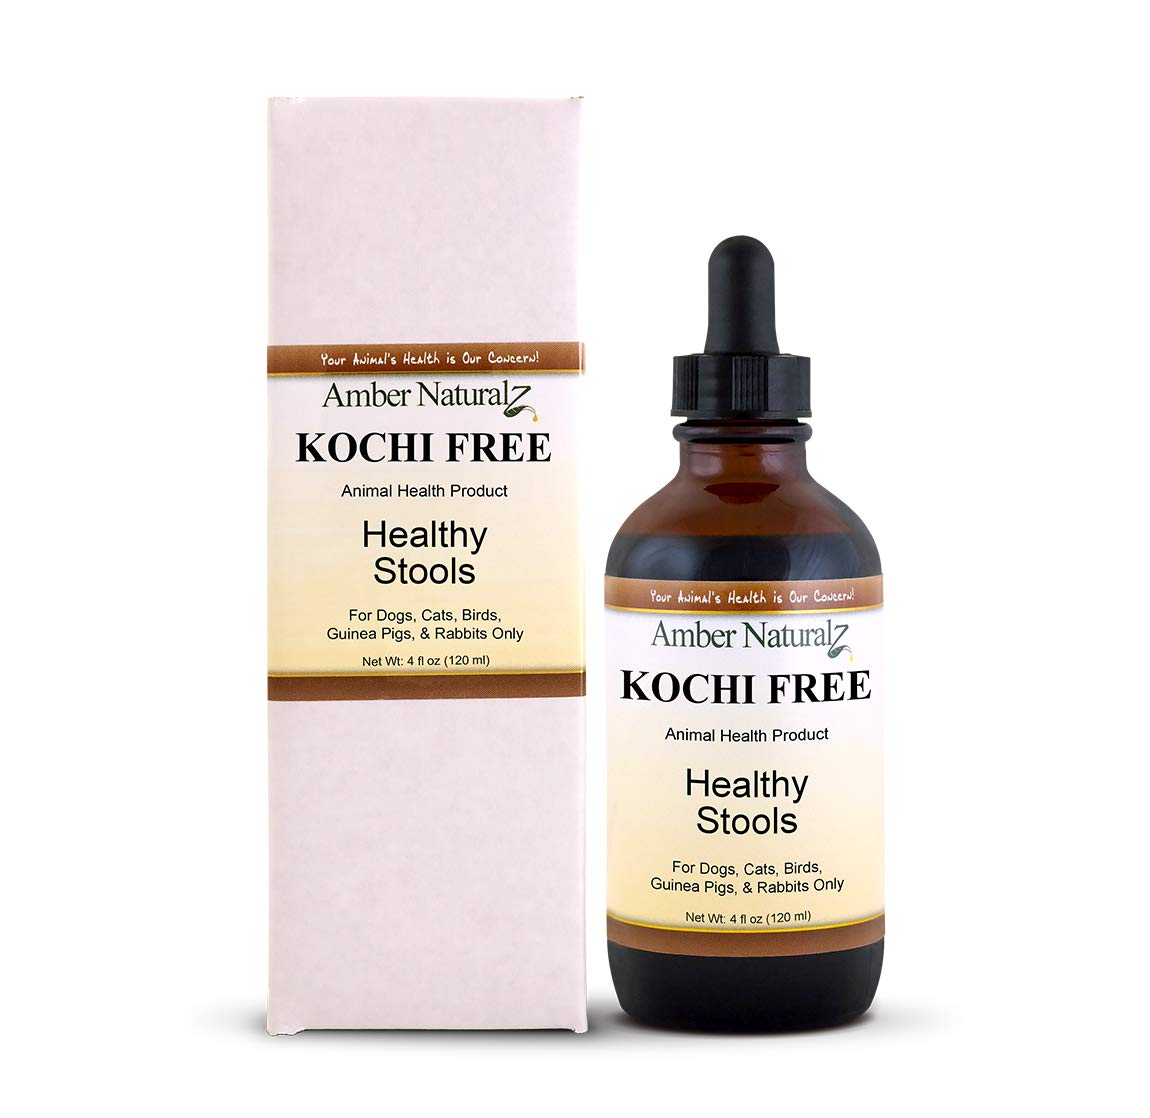 Amber Naturalz Kochi Free Pet Supplement, 1-oz